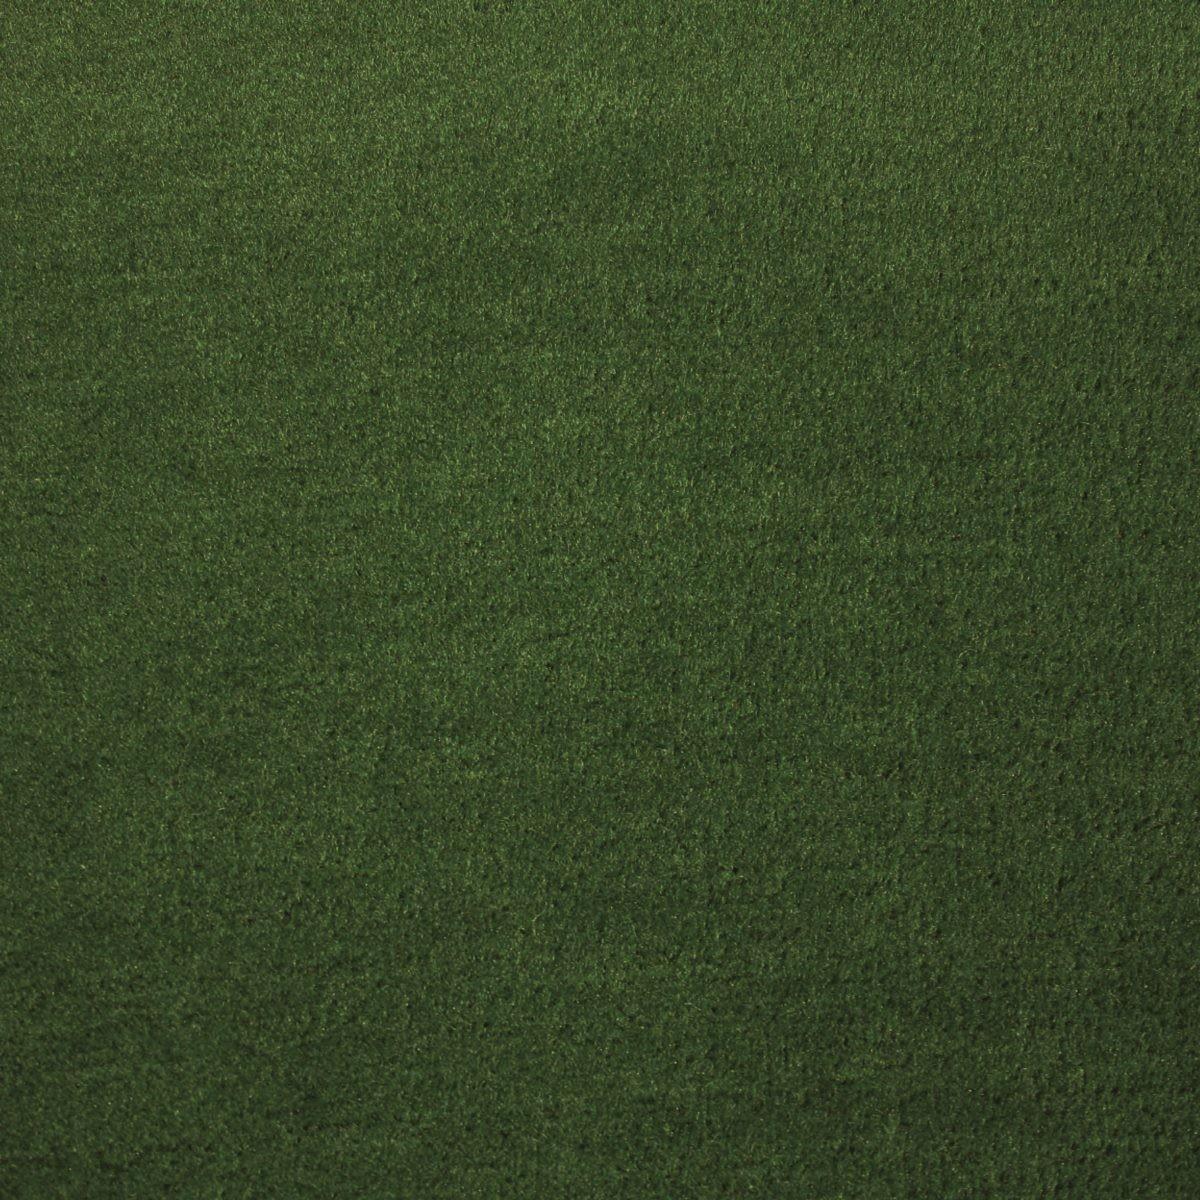 GENTLE GRASS 13O643